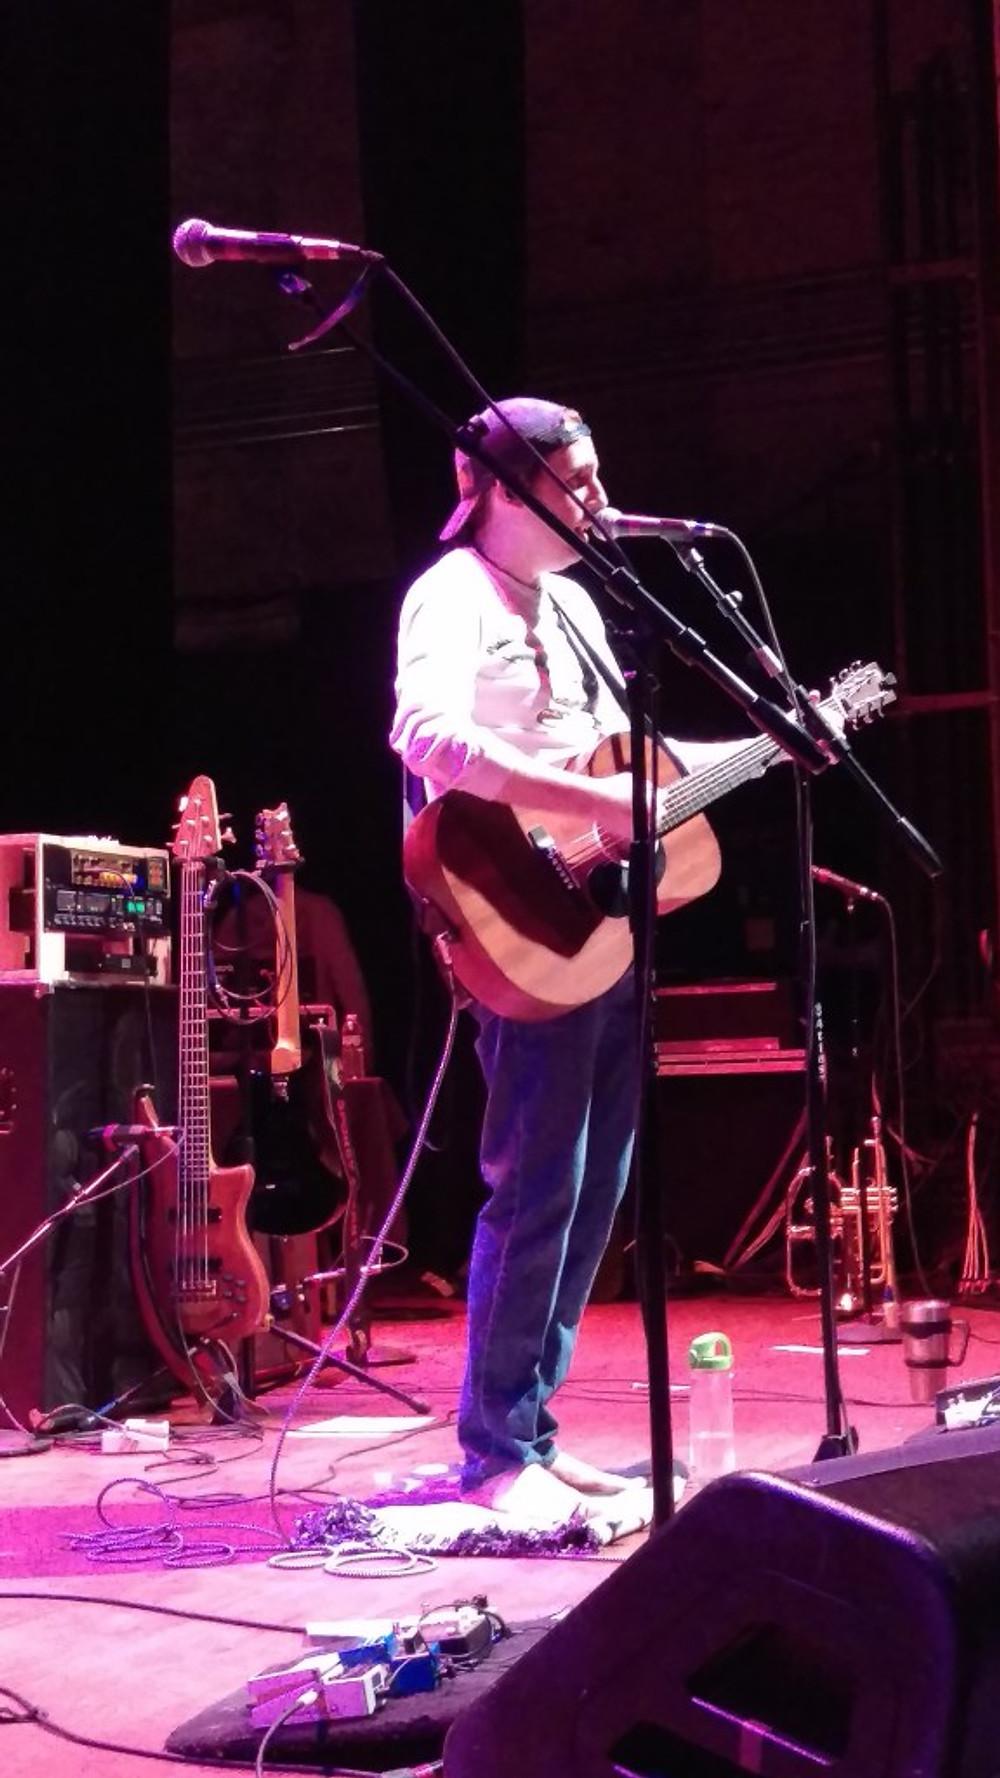 Spokey Speaky lead singer Jeff Ferrara on stage at The Queen.